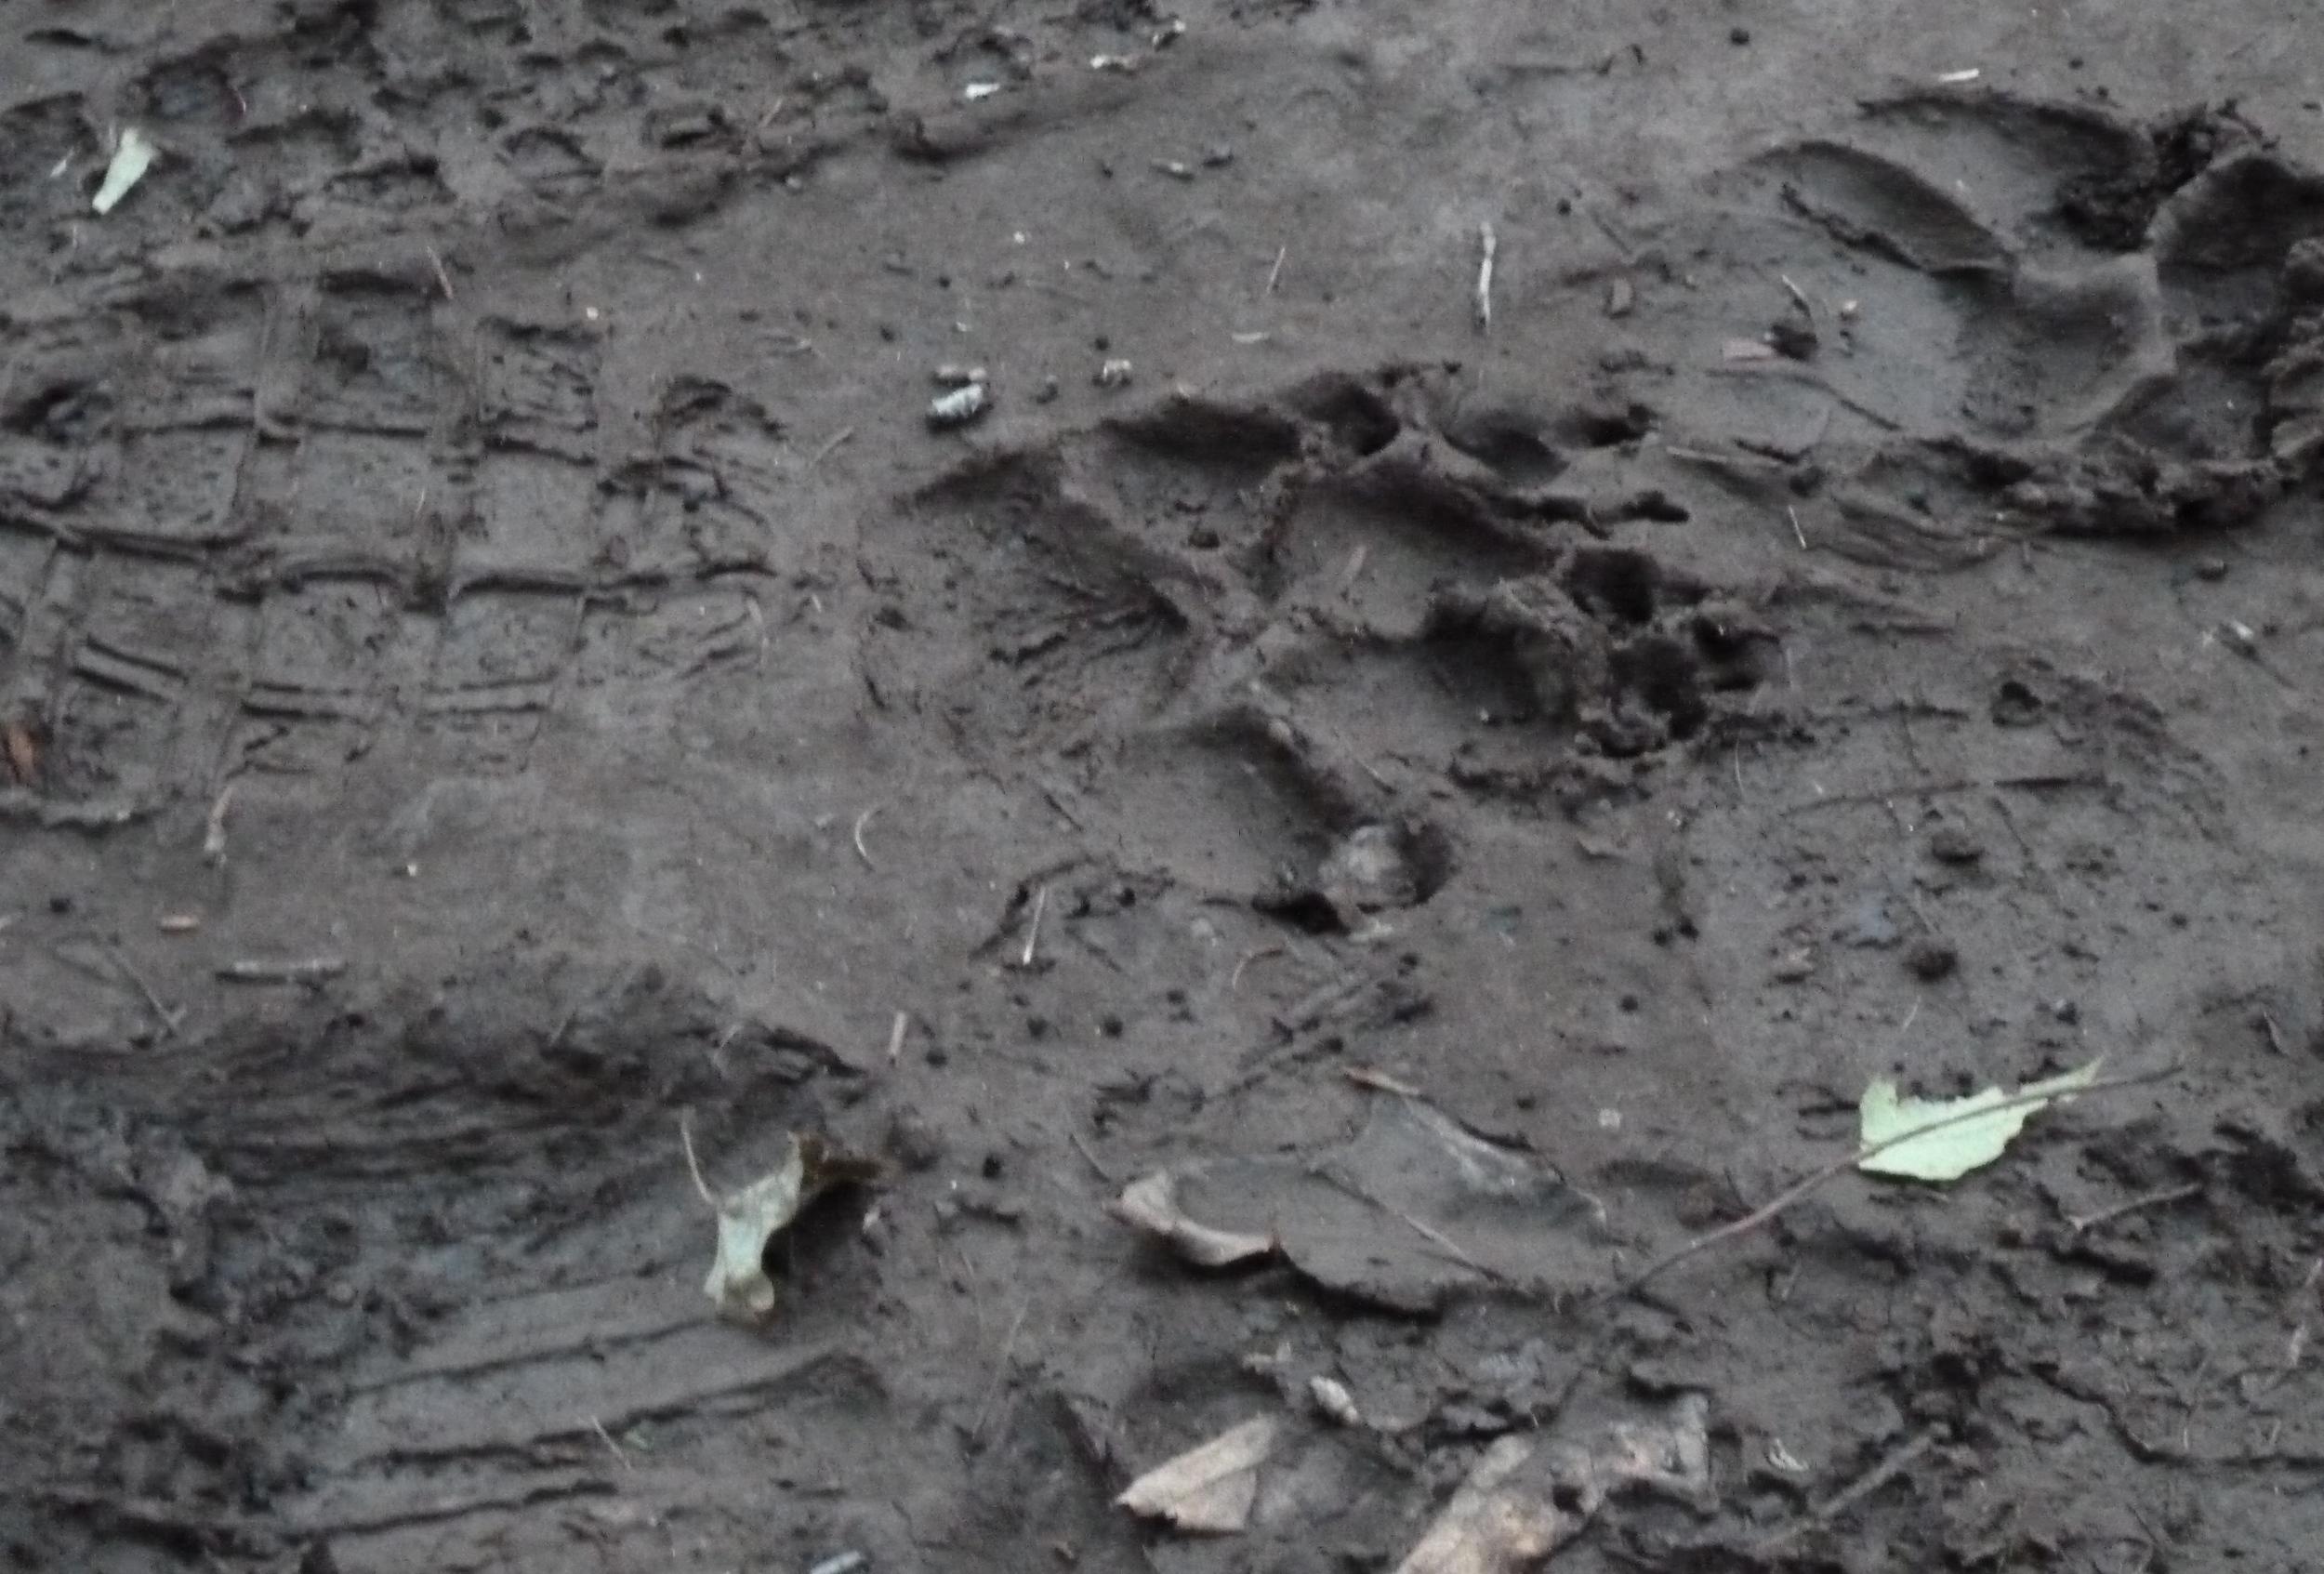 Bear paws + adult hiking boot print